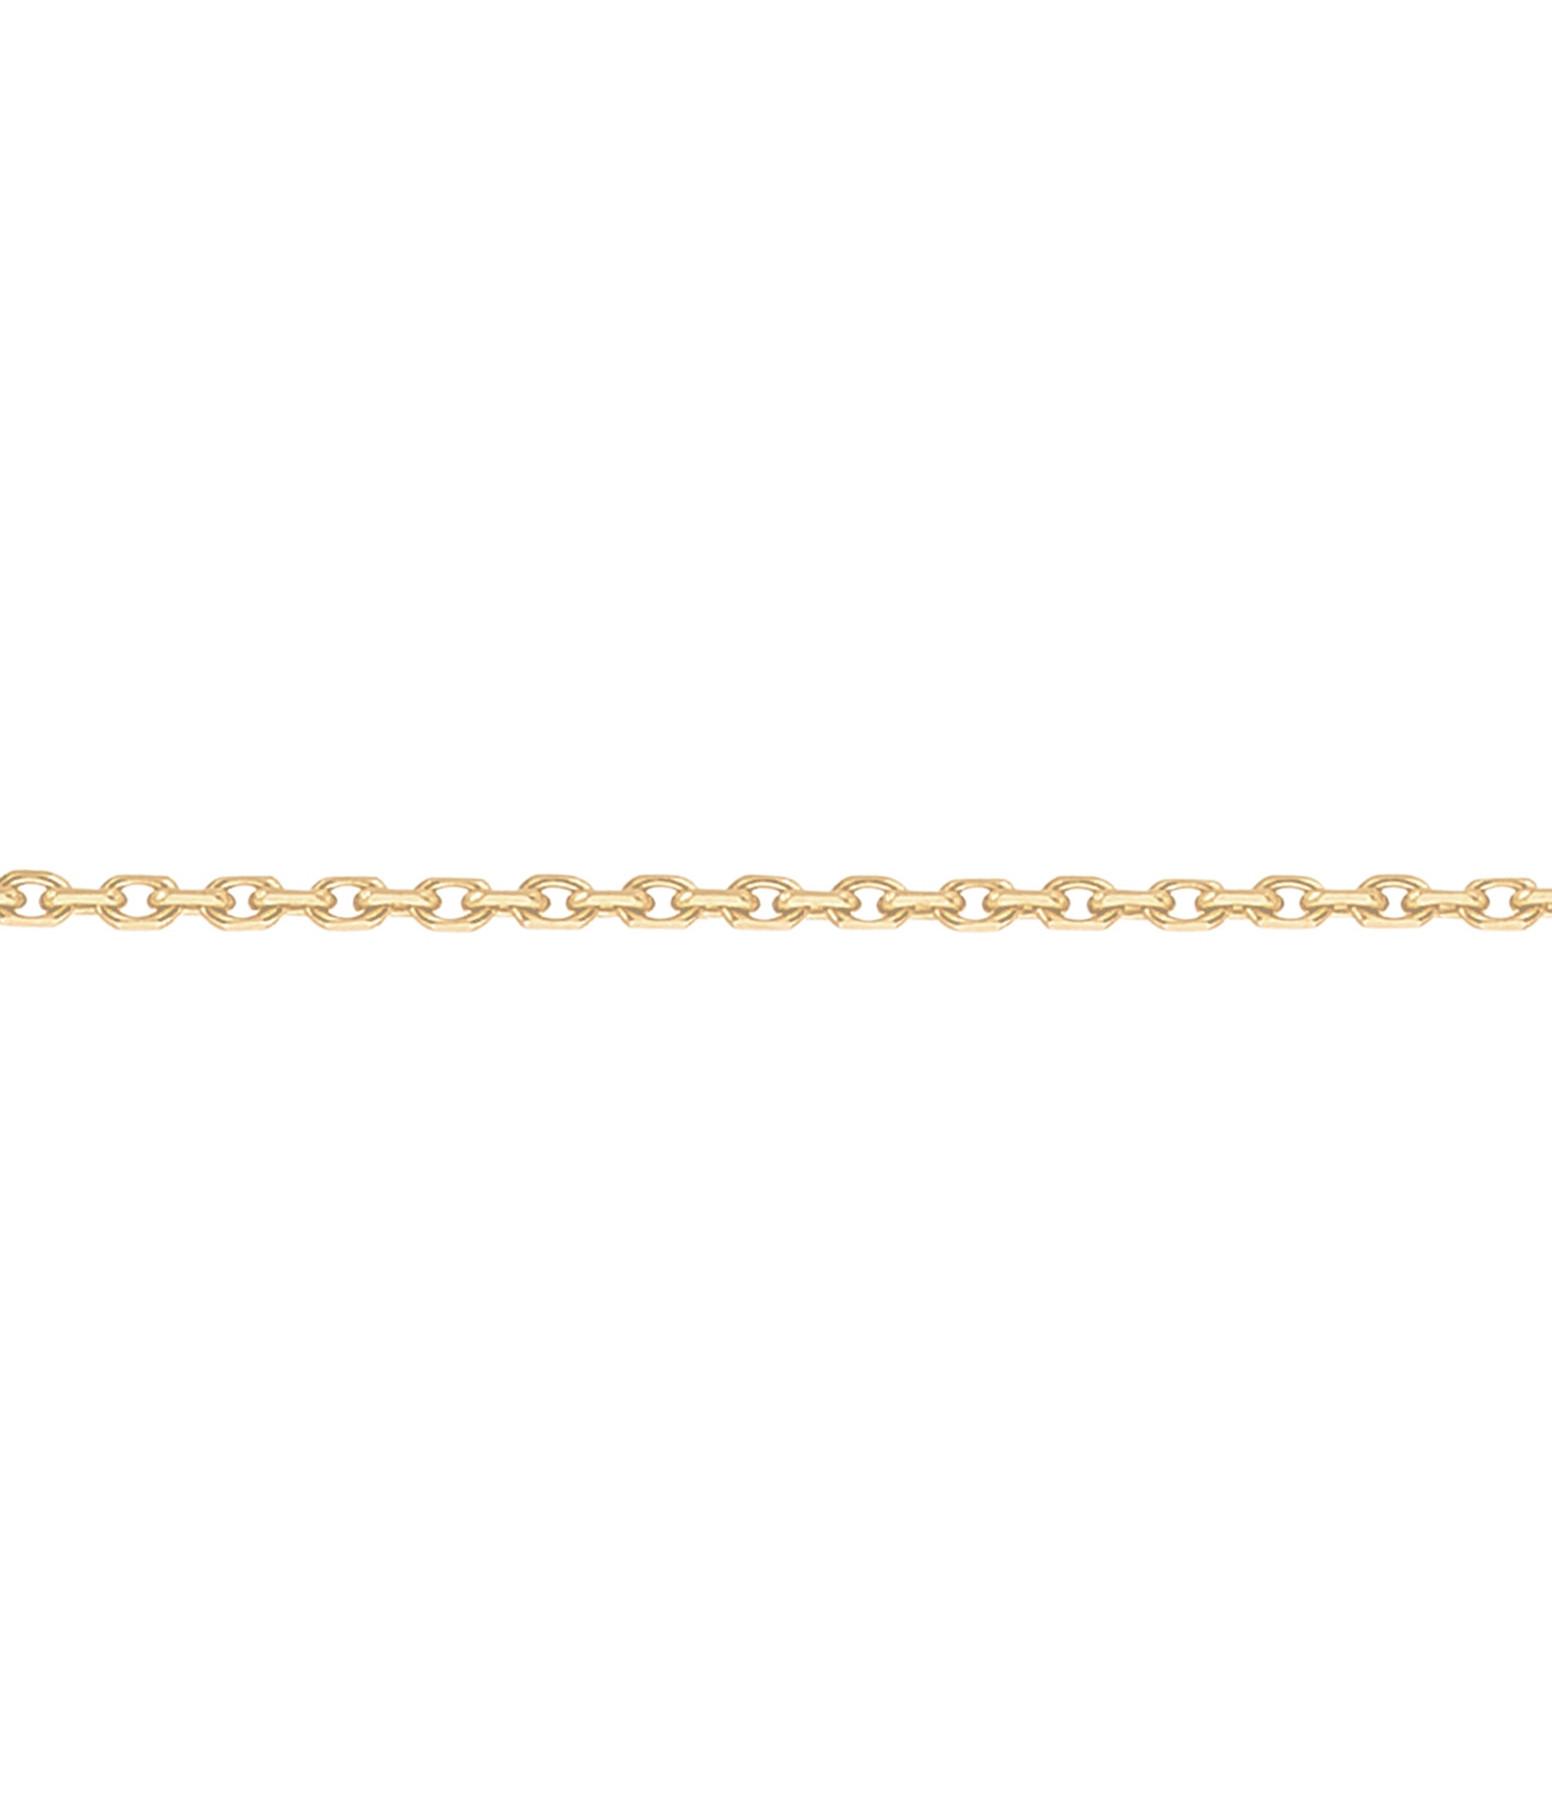 Chaîne Forçat Or Diamantée 40 cm - Or blanc - Stone